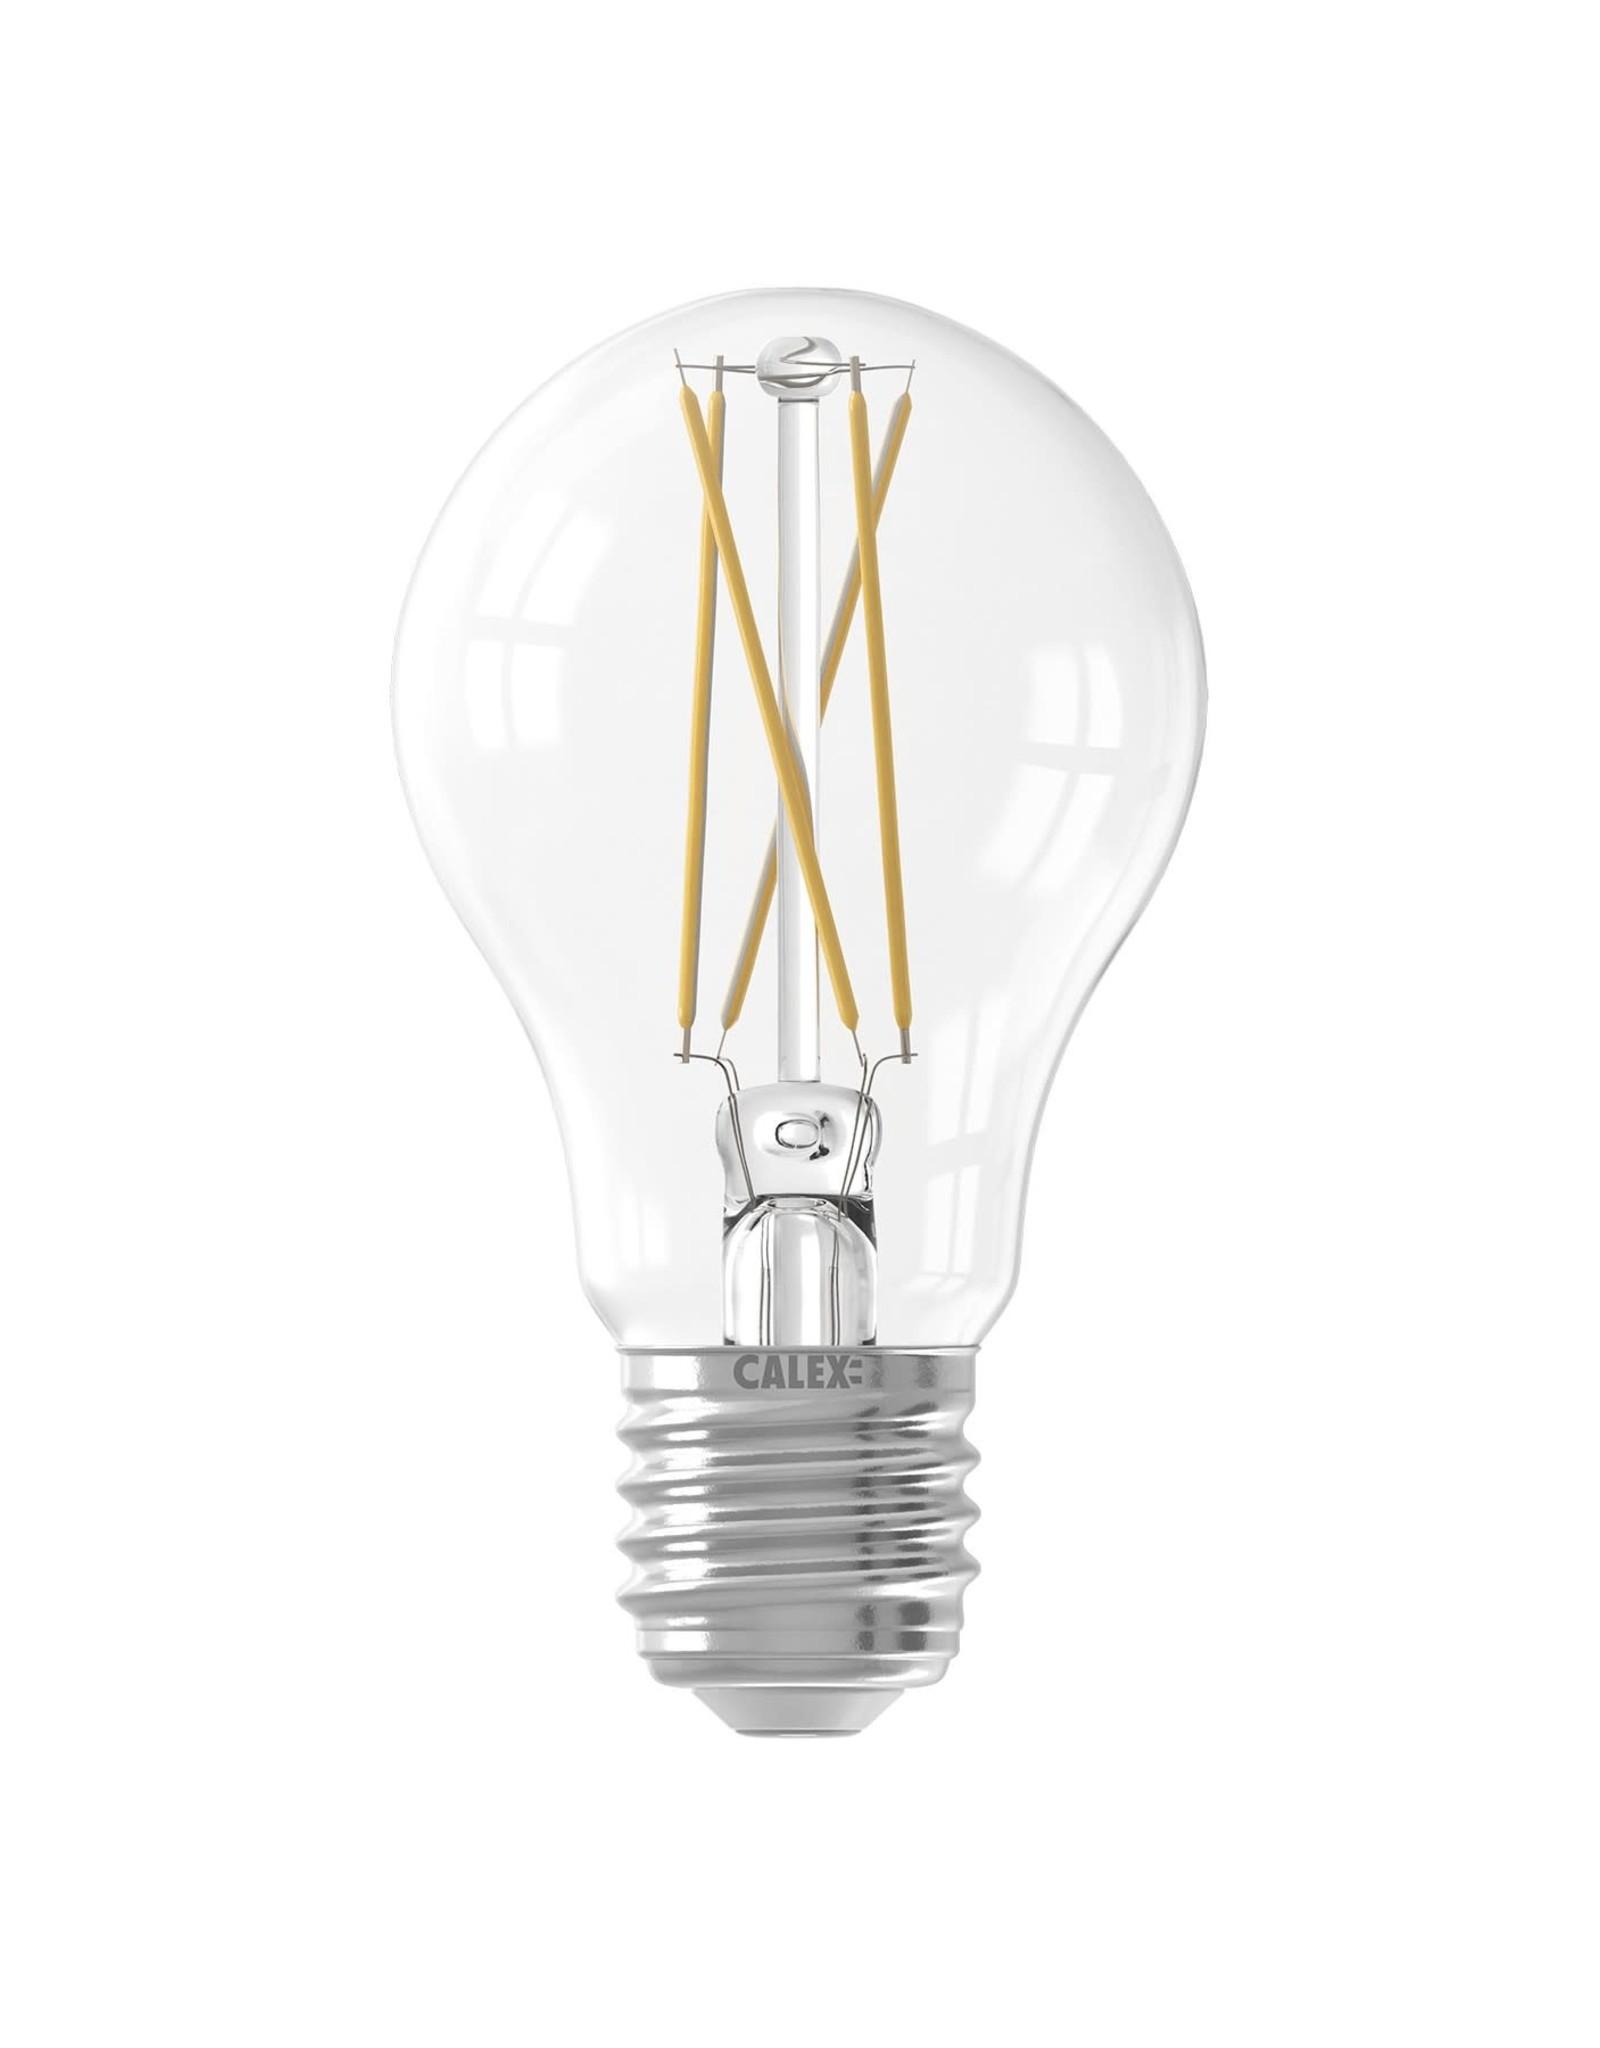 Calex Calex Smart LED Filament Helder Standaardlamp A60 E27 220-240V 7W 806lm 1800-3000K